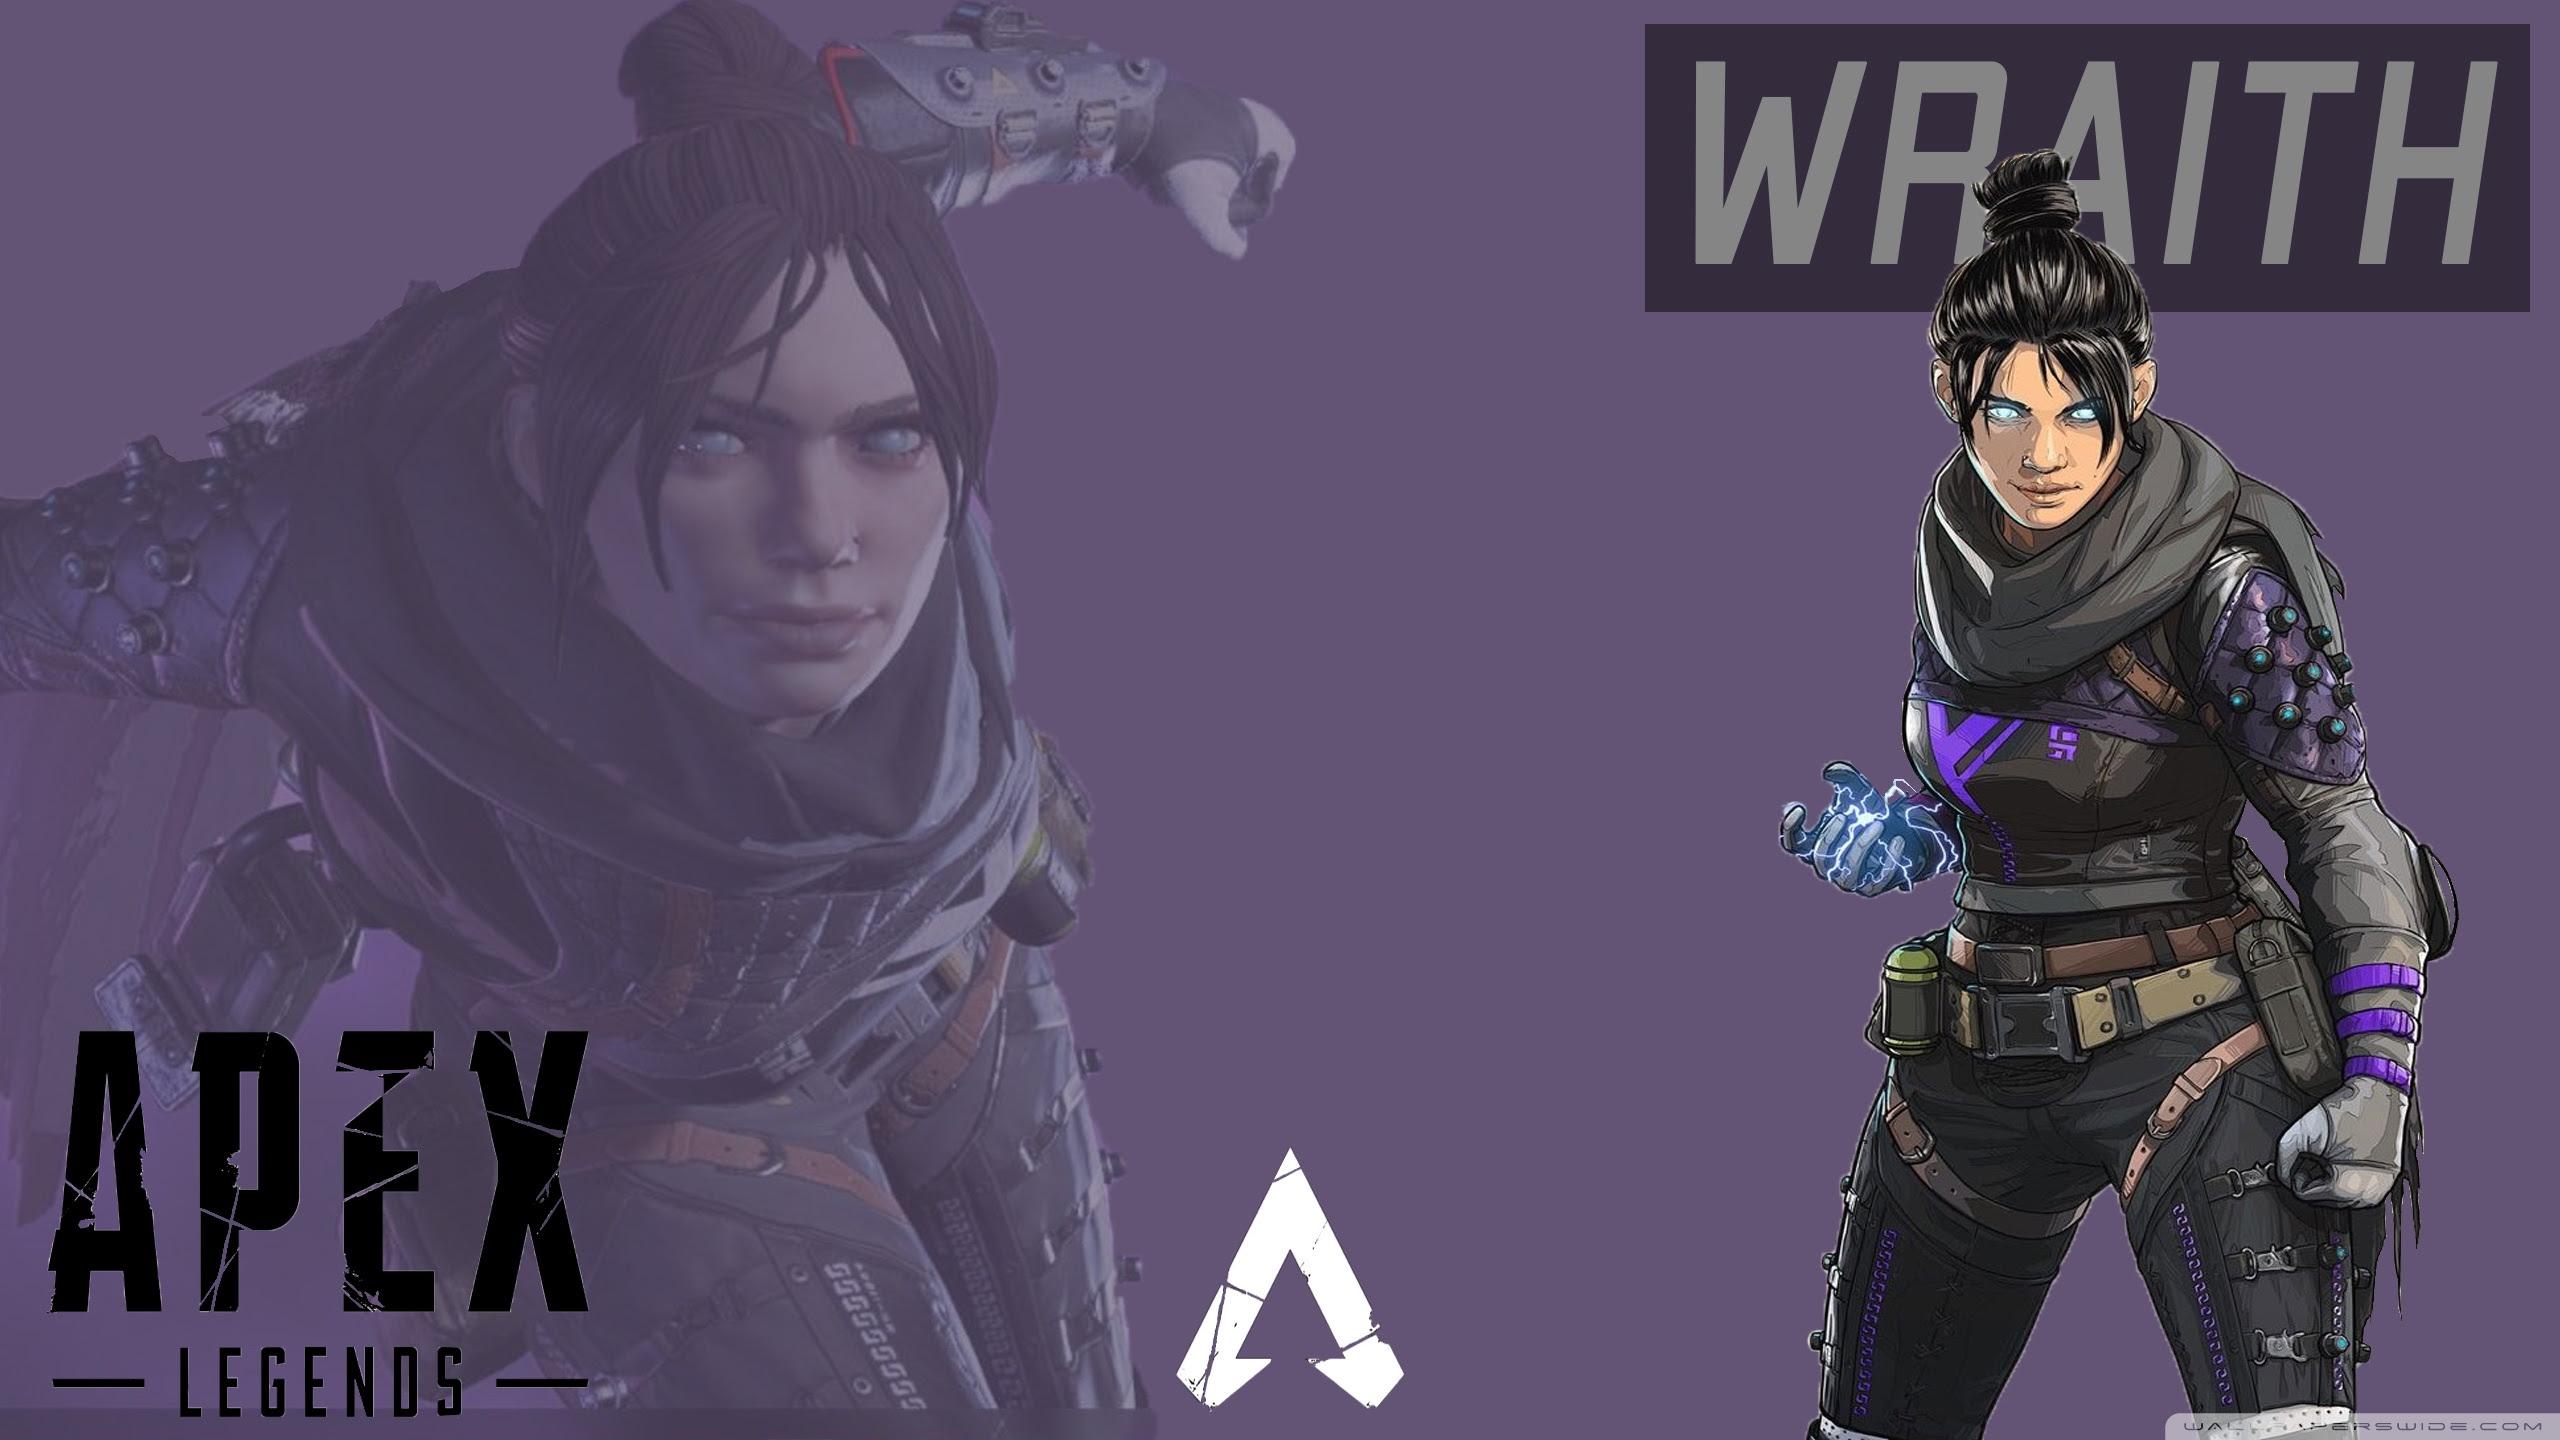 Apex Legends Wraith Wallpaper Hd Romancemai